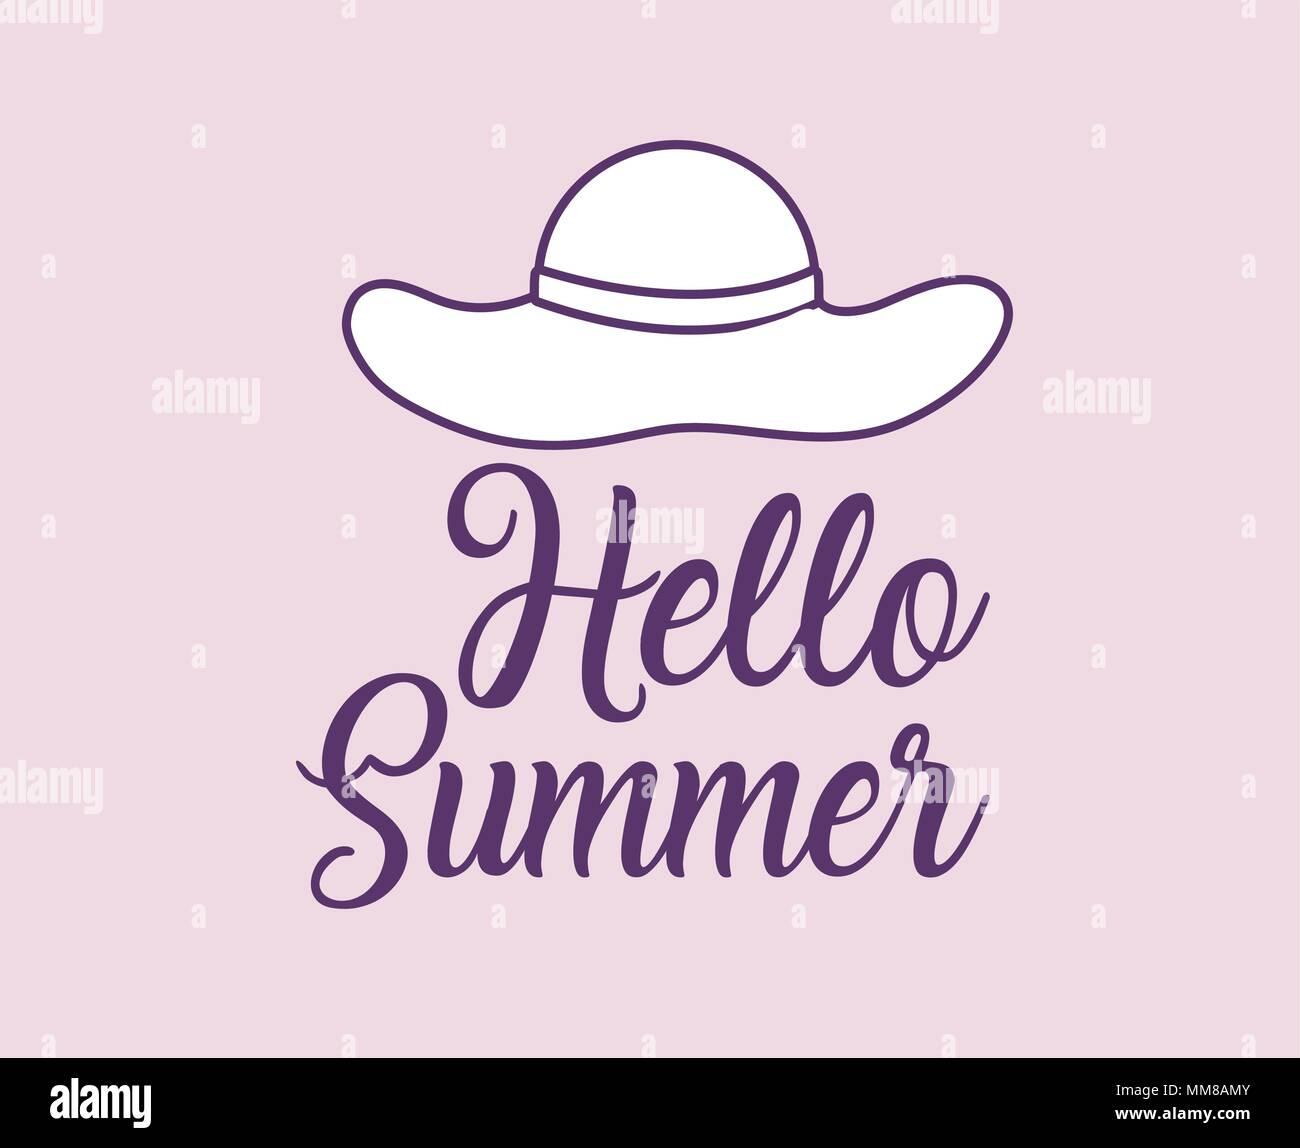 51bb799db6b Hello summer design with beach hat over background